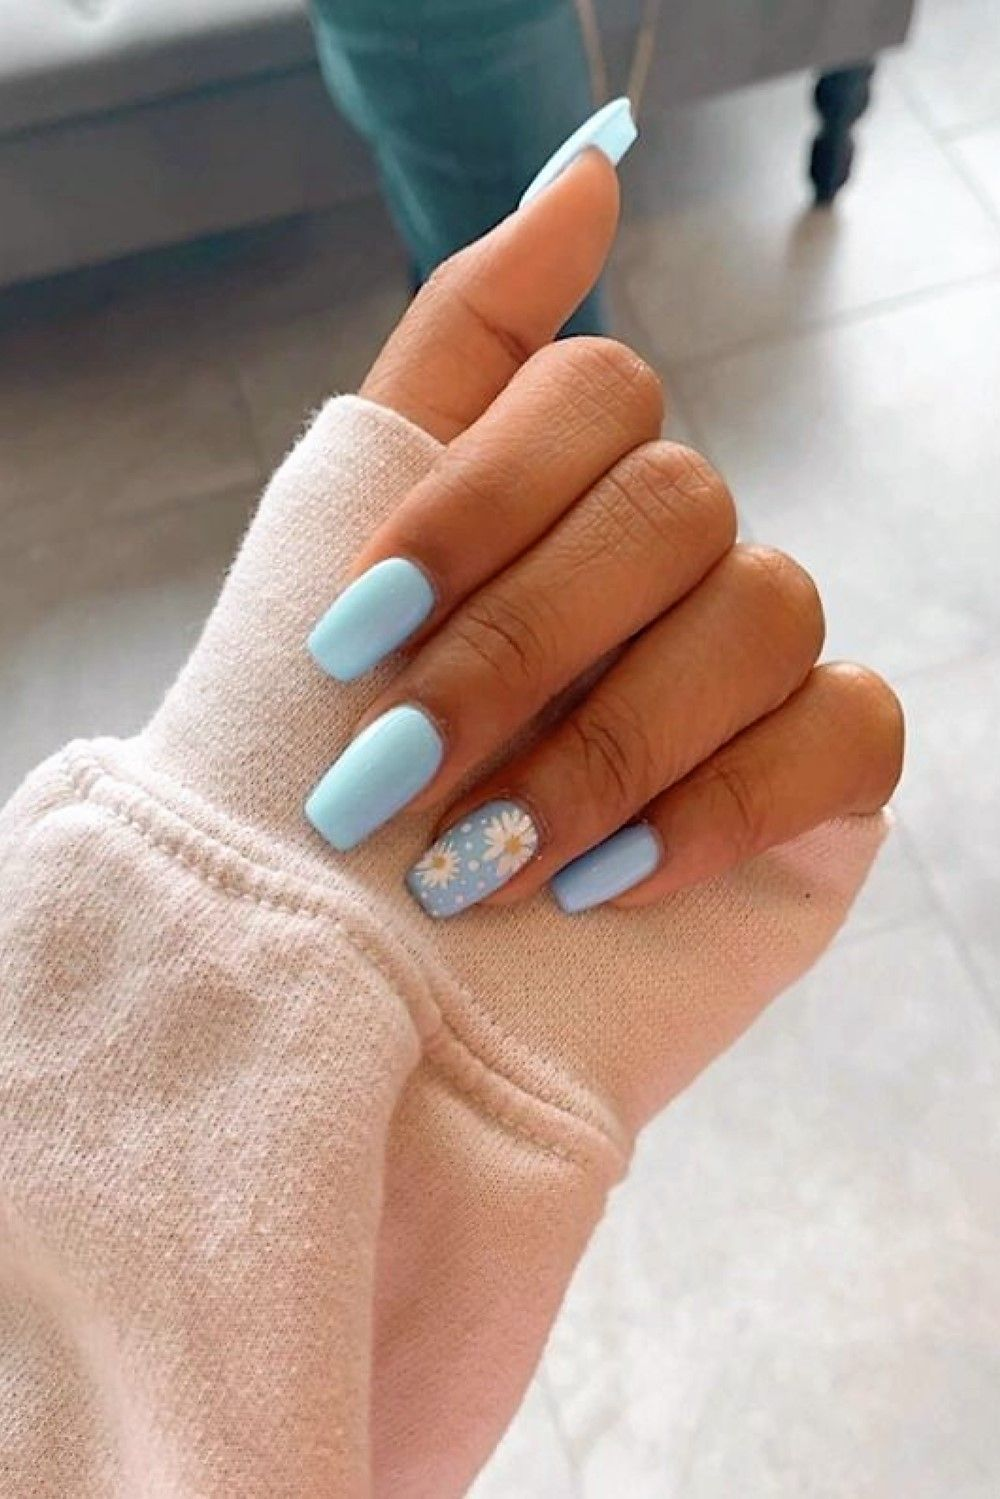 Nail Art Designs Beautiful Flower Nail Art Designs Ideas In 2020 Short Acrylic Nails Designs Best Acrylic Nails Simple Acrylic Nails